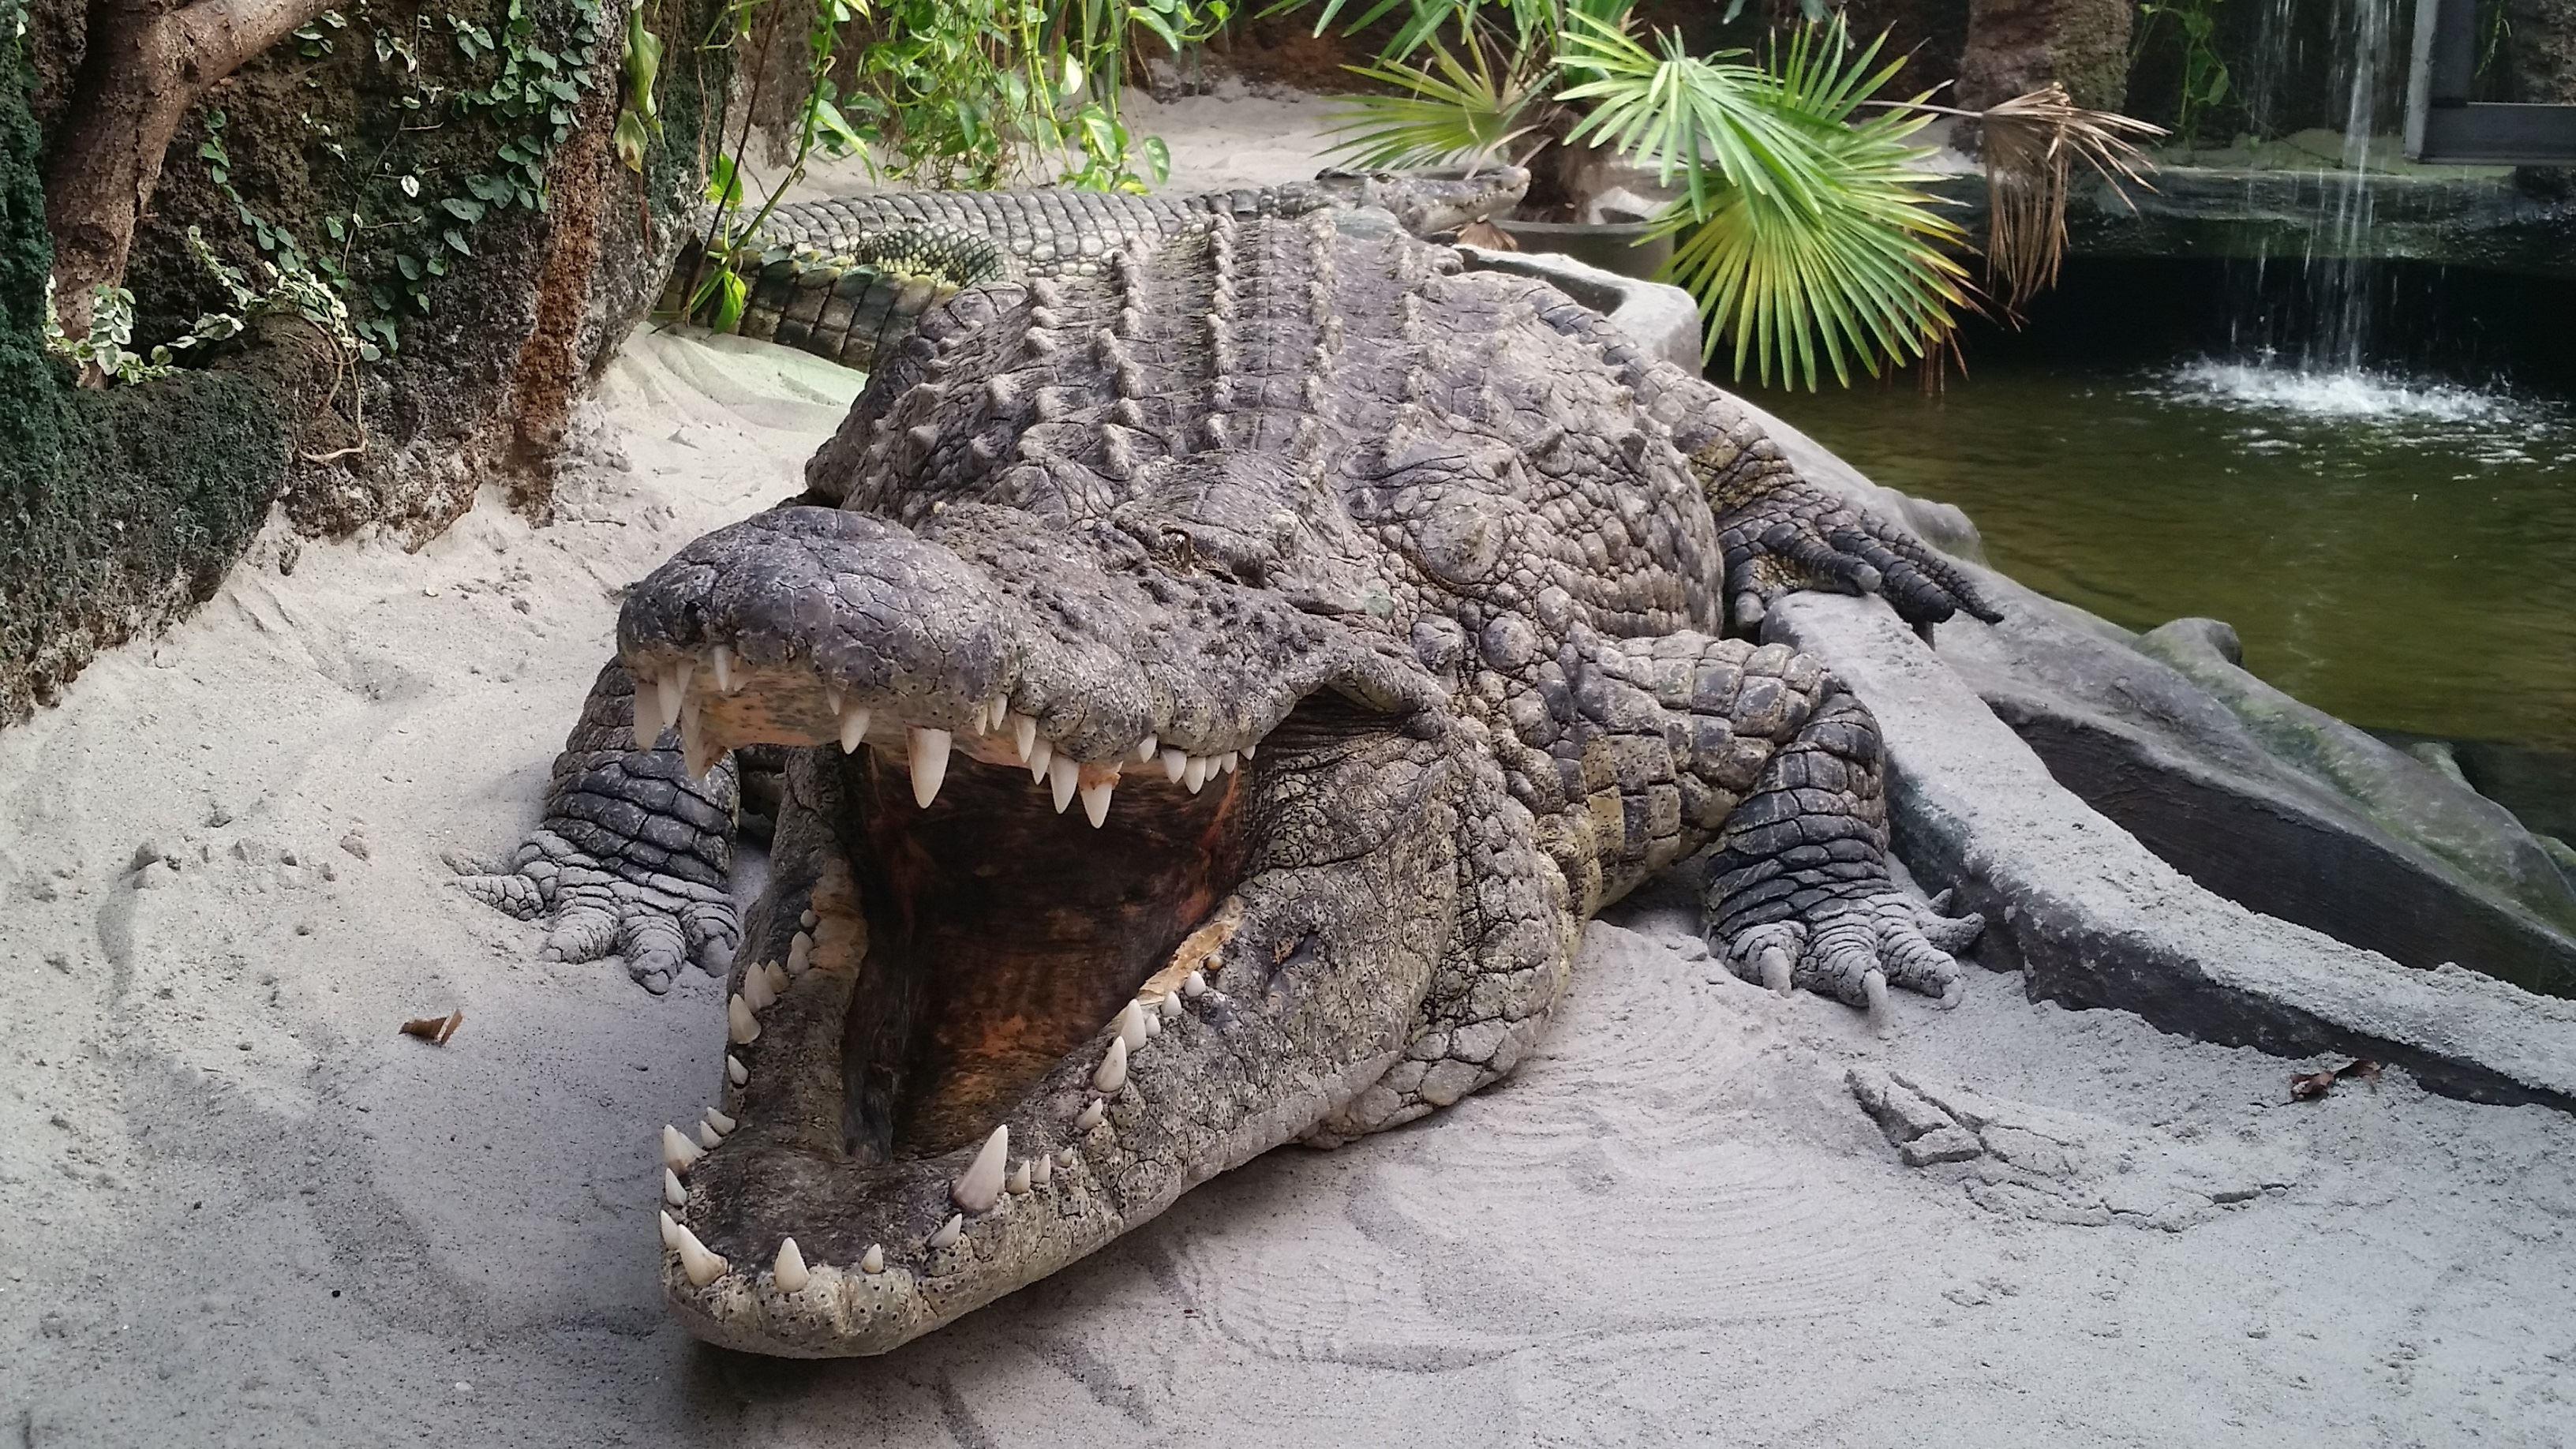 Krokodille Zoo i efterårsferien - NatZoo vender tilbage